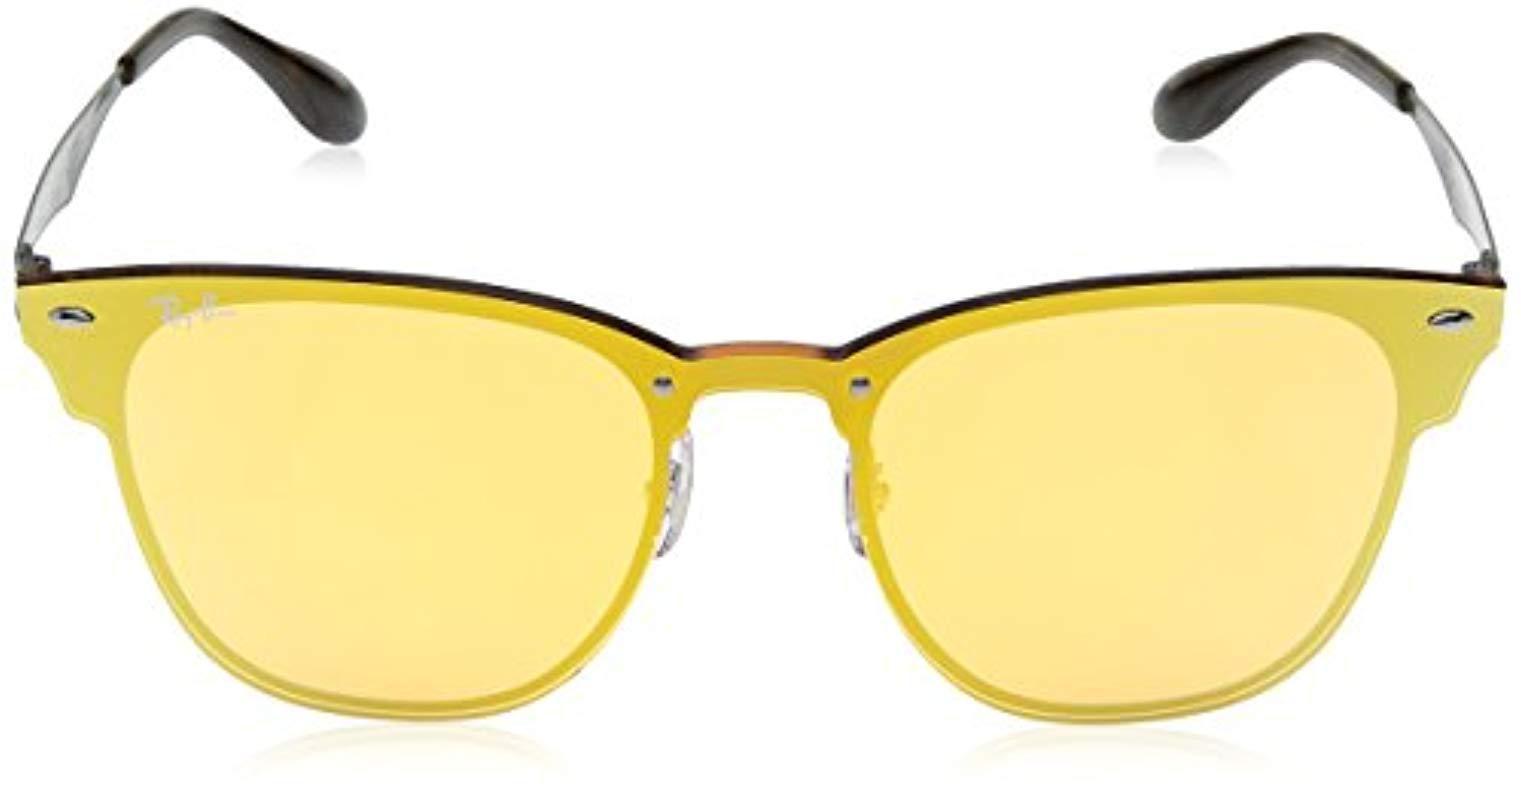 28d6b4d3e8 Ray-Ban - Black Unisex-adult s 3576n Sunglasses